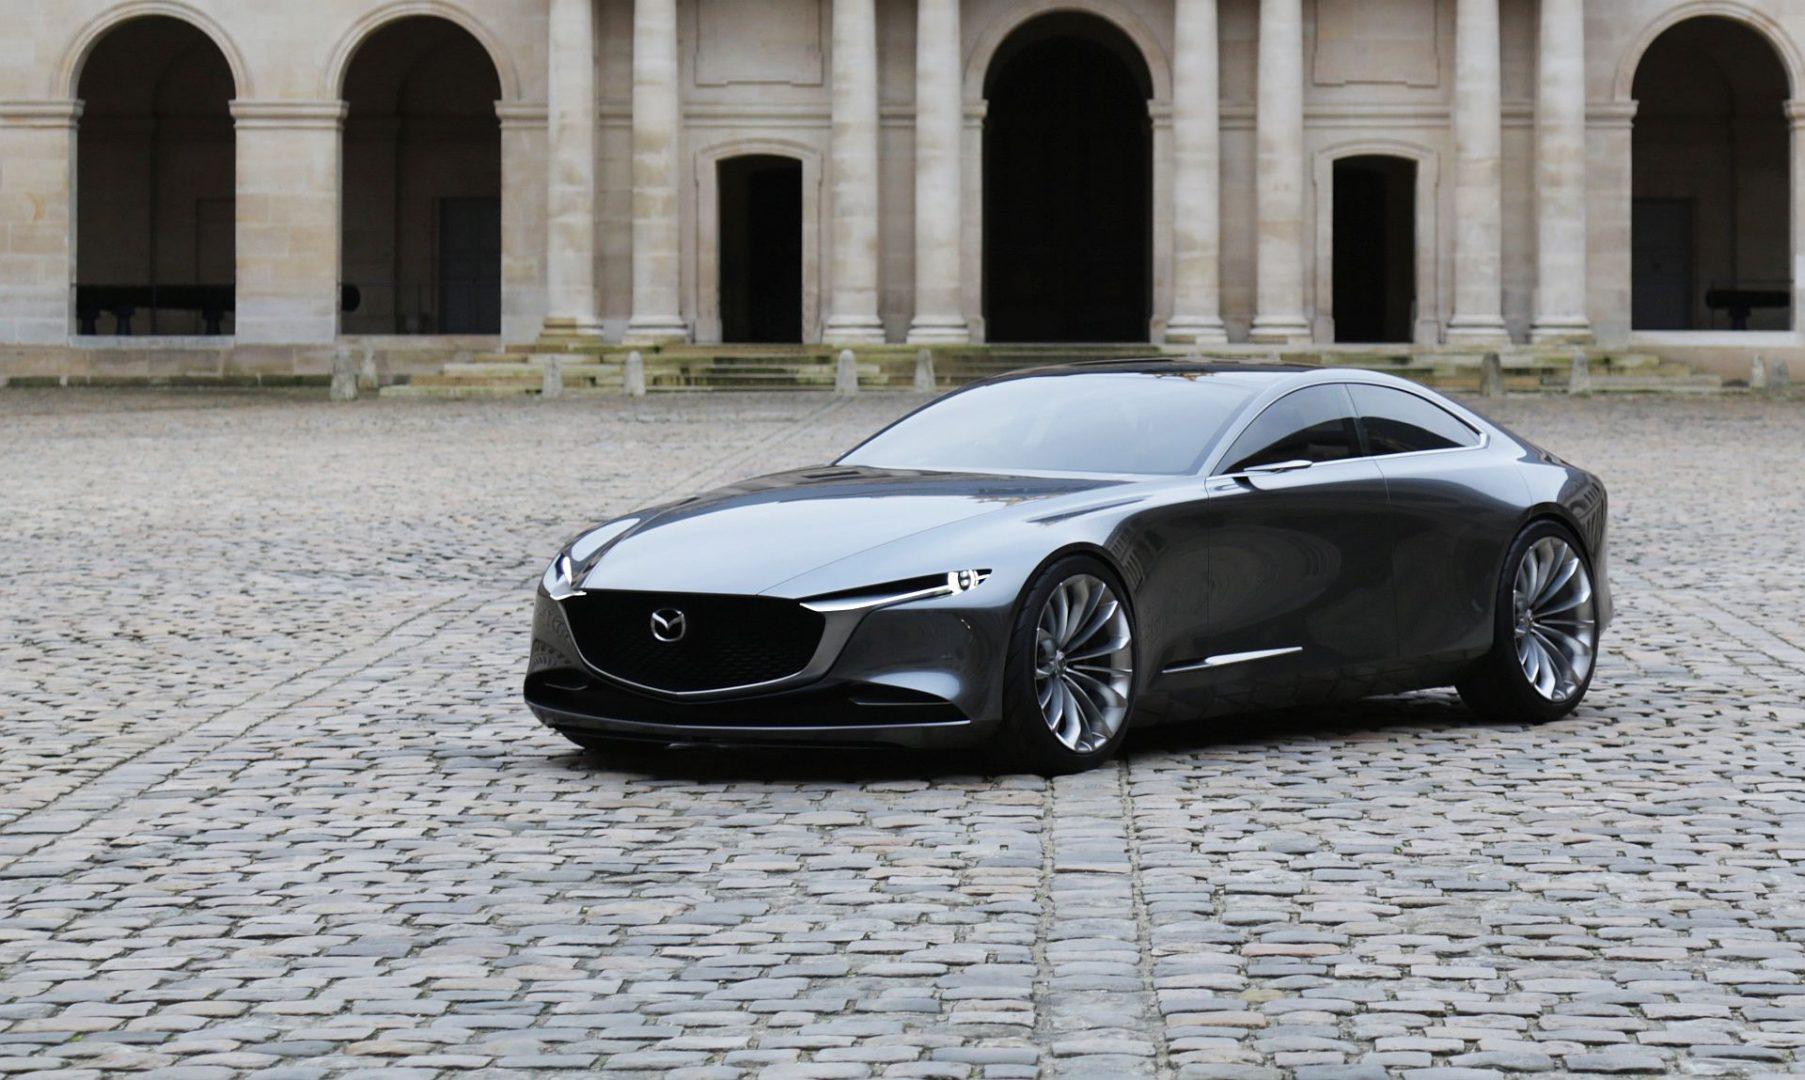 Nova Mazda6 bi mogla dobiti 6-cilindrični Skyactiv-X motor i pogon na stražnje kotače